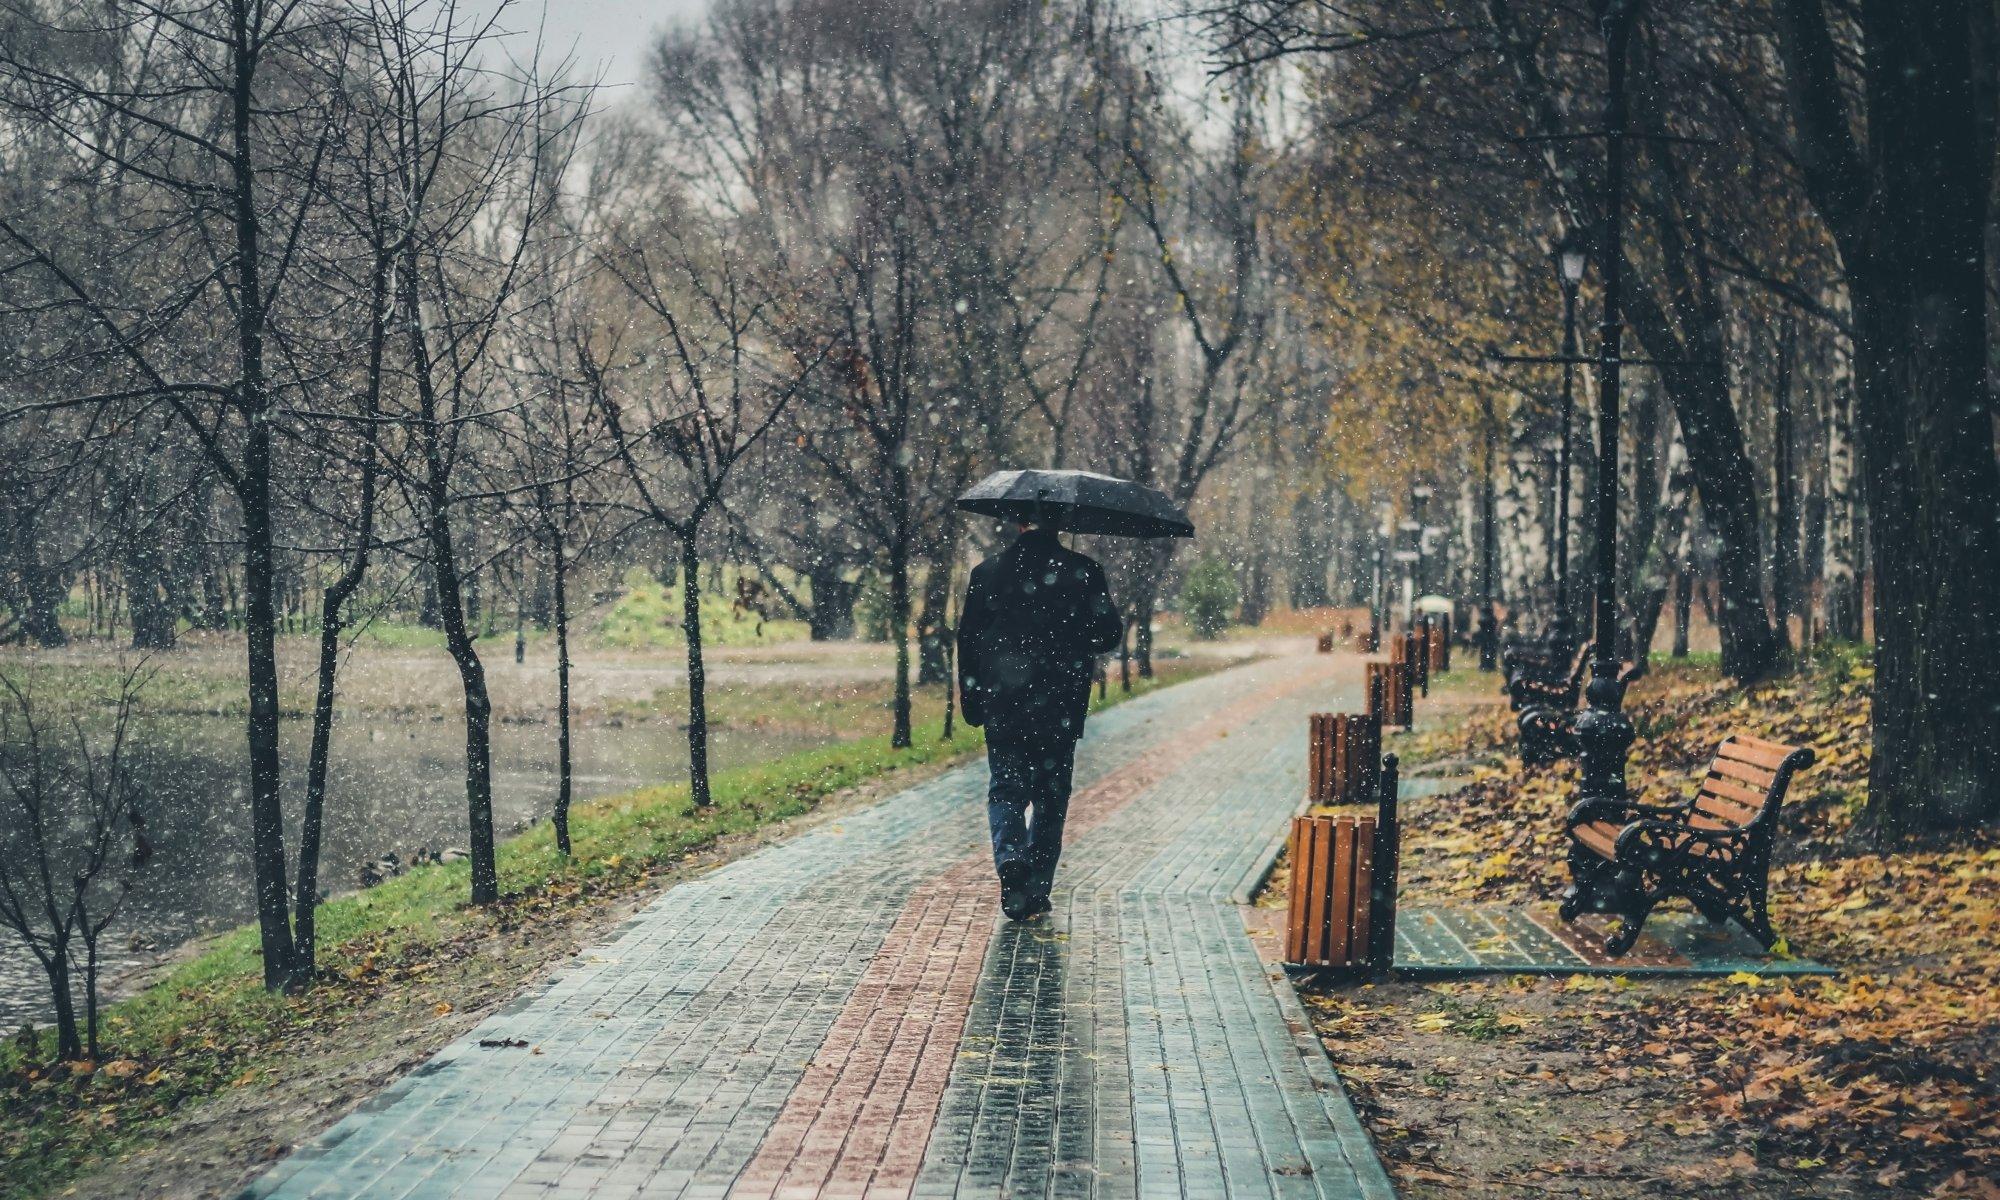 Heftige Regenfälle im Herbst.